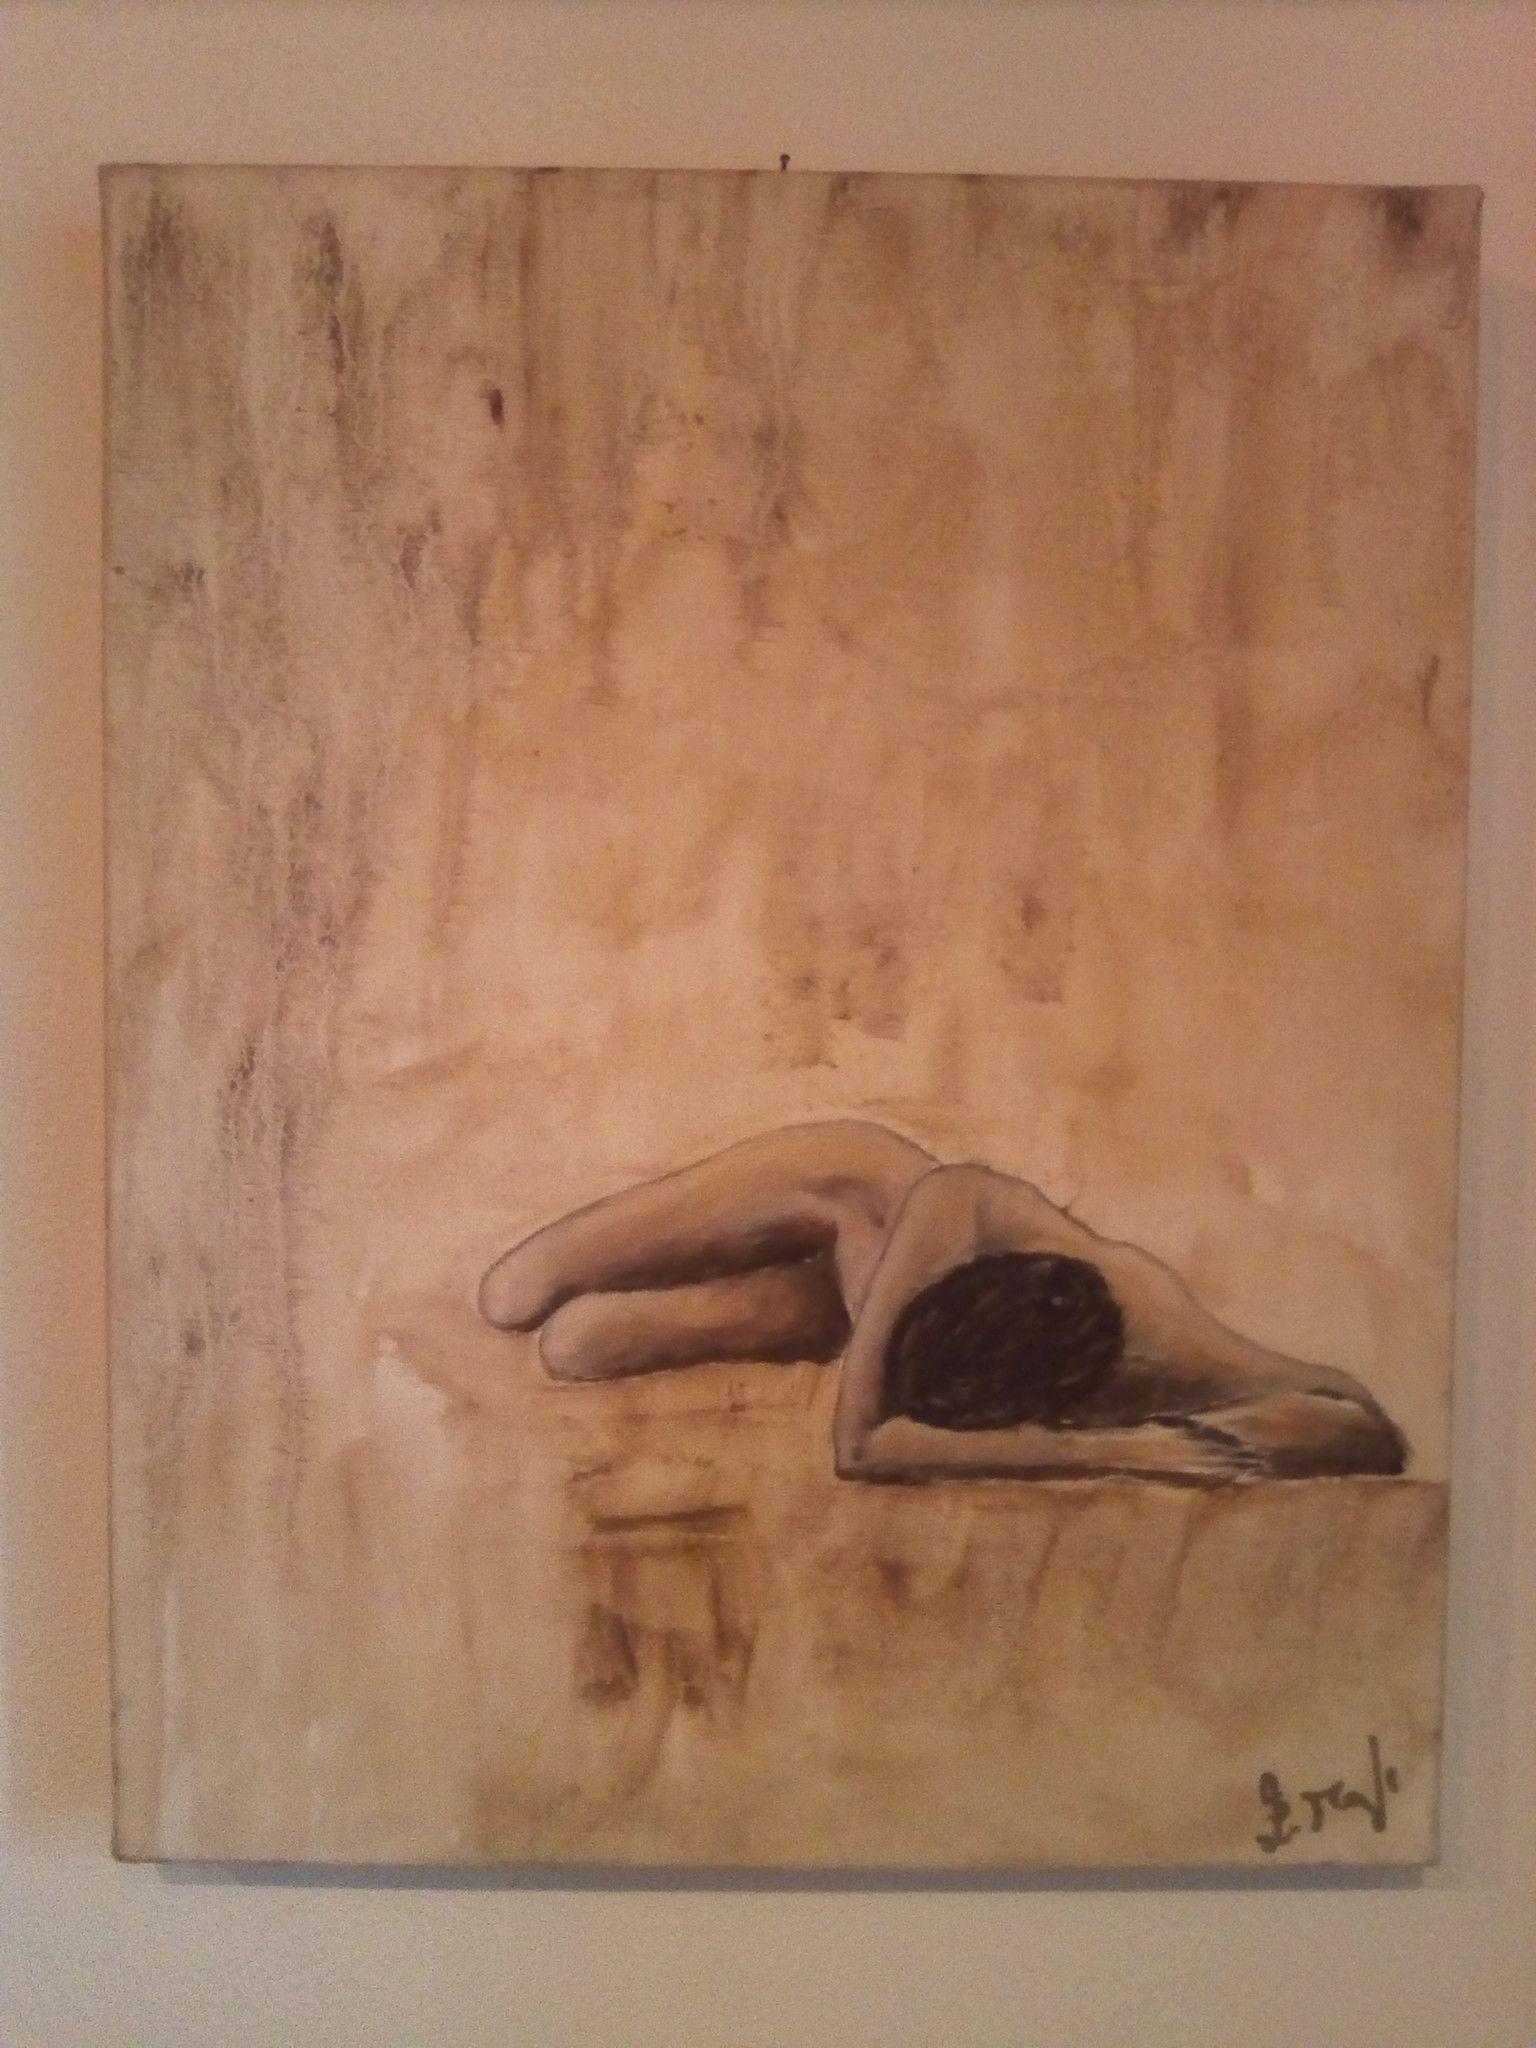 "OLIO SU TELA ELISABETTA MANGHI "" GOCCE DI MEMORIA ""  dimensioni L 40 x H 50 cm."